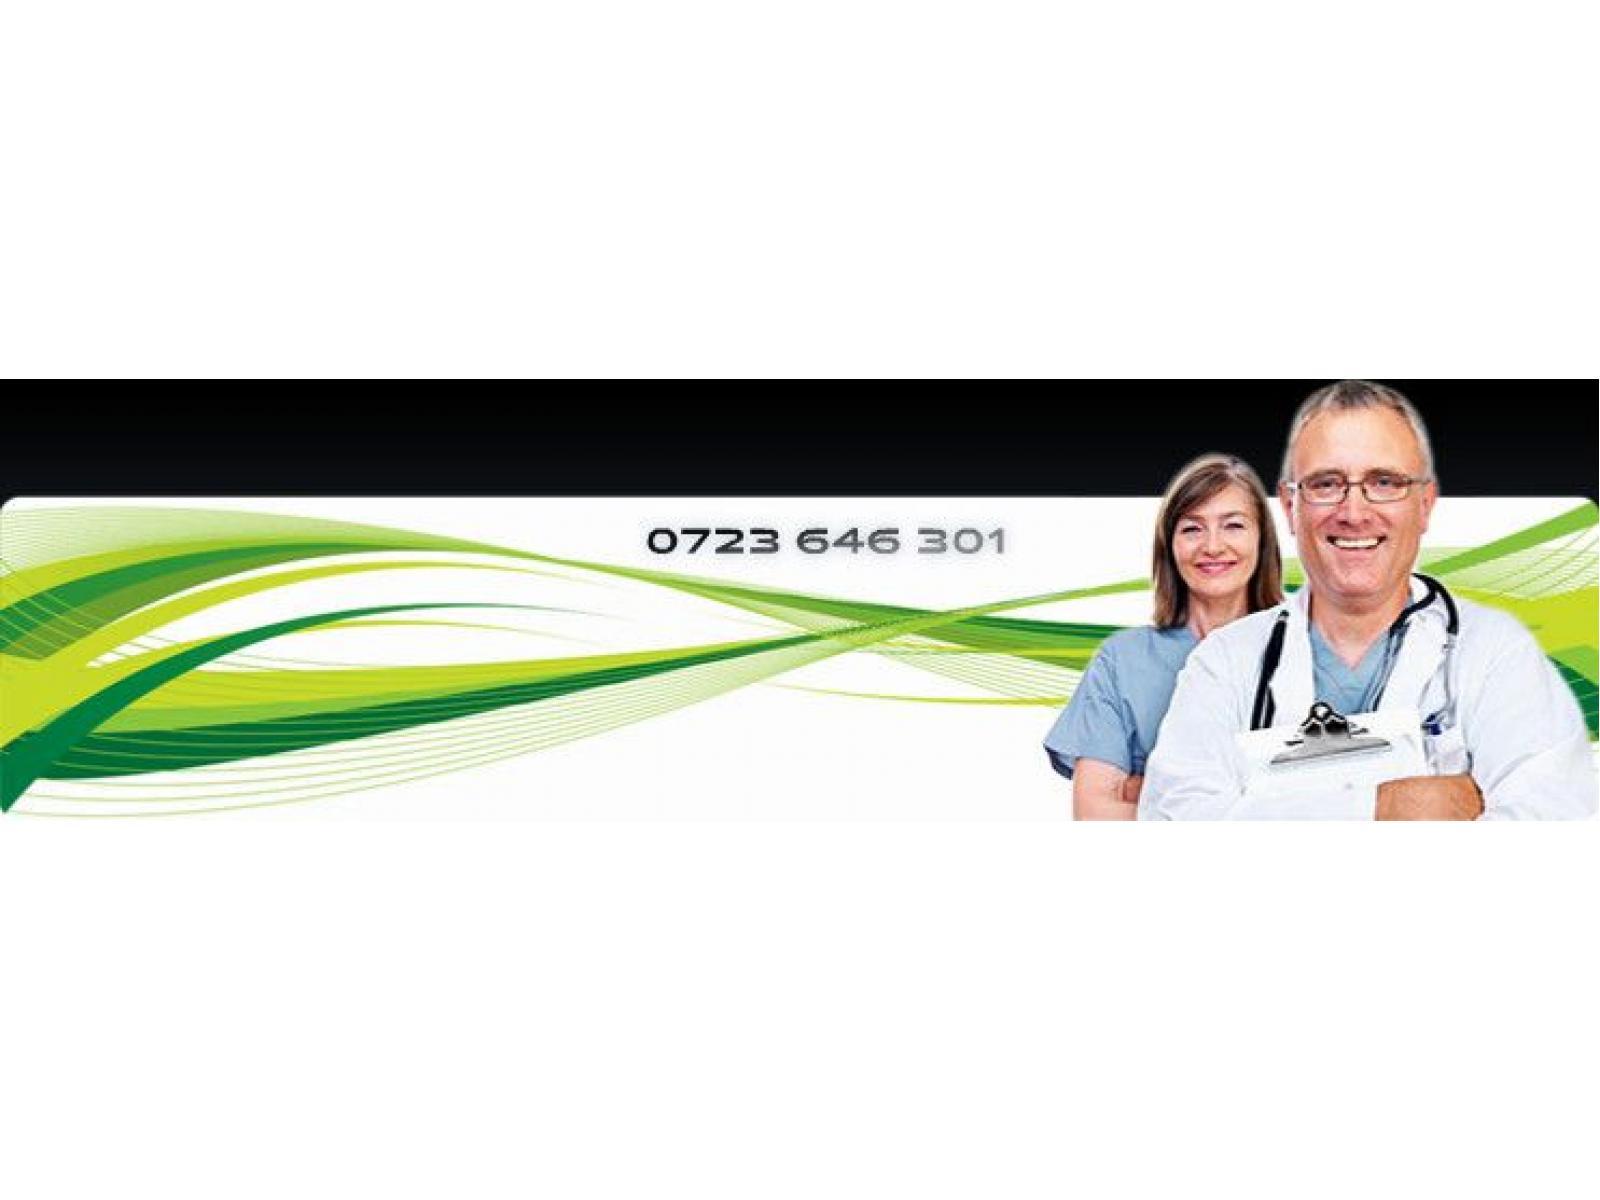 CMI Medicina Muncii 0723 64 63 01 - coperta_mm.jpg